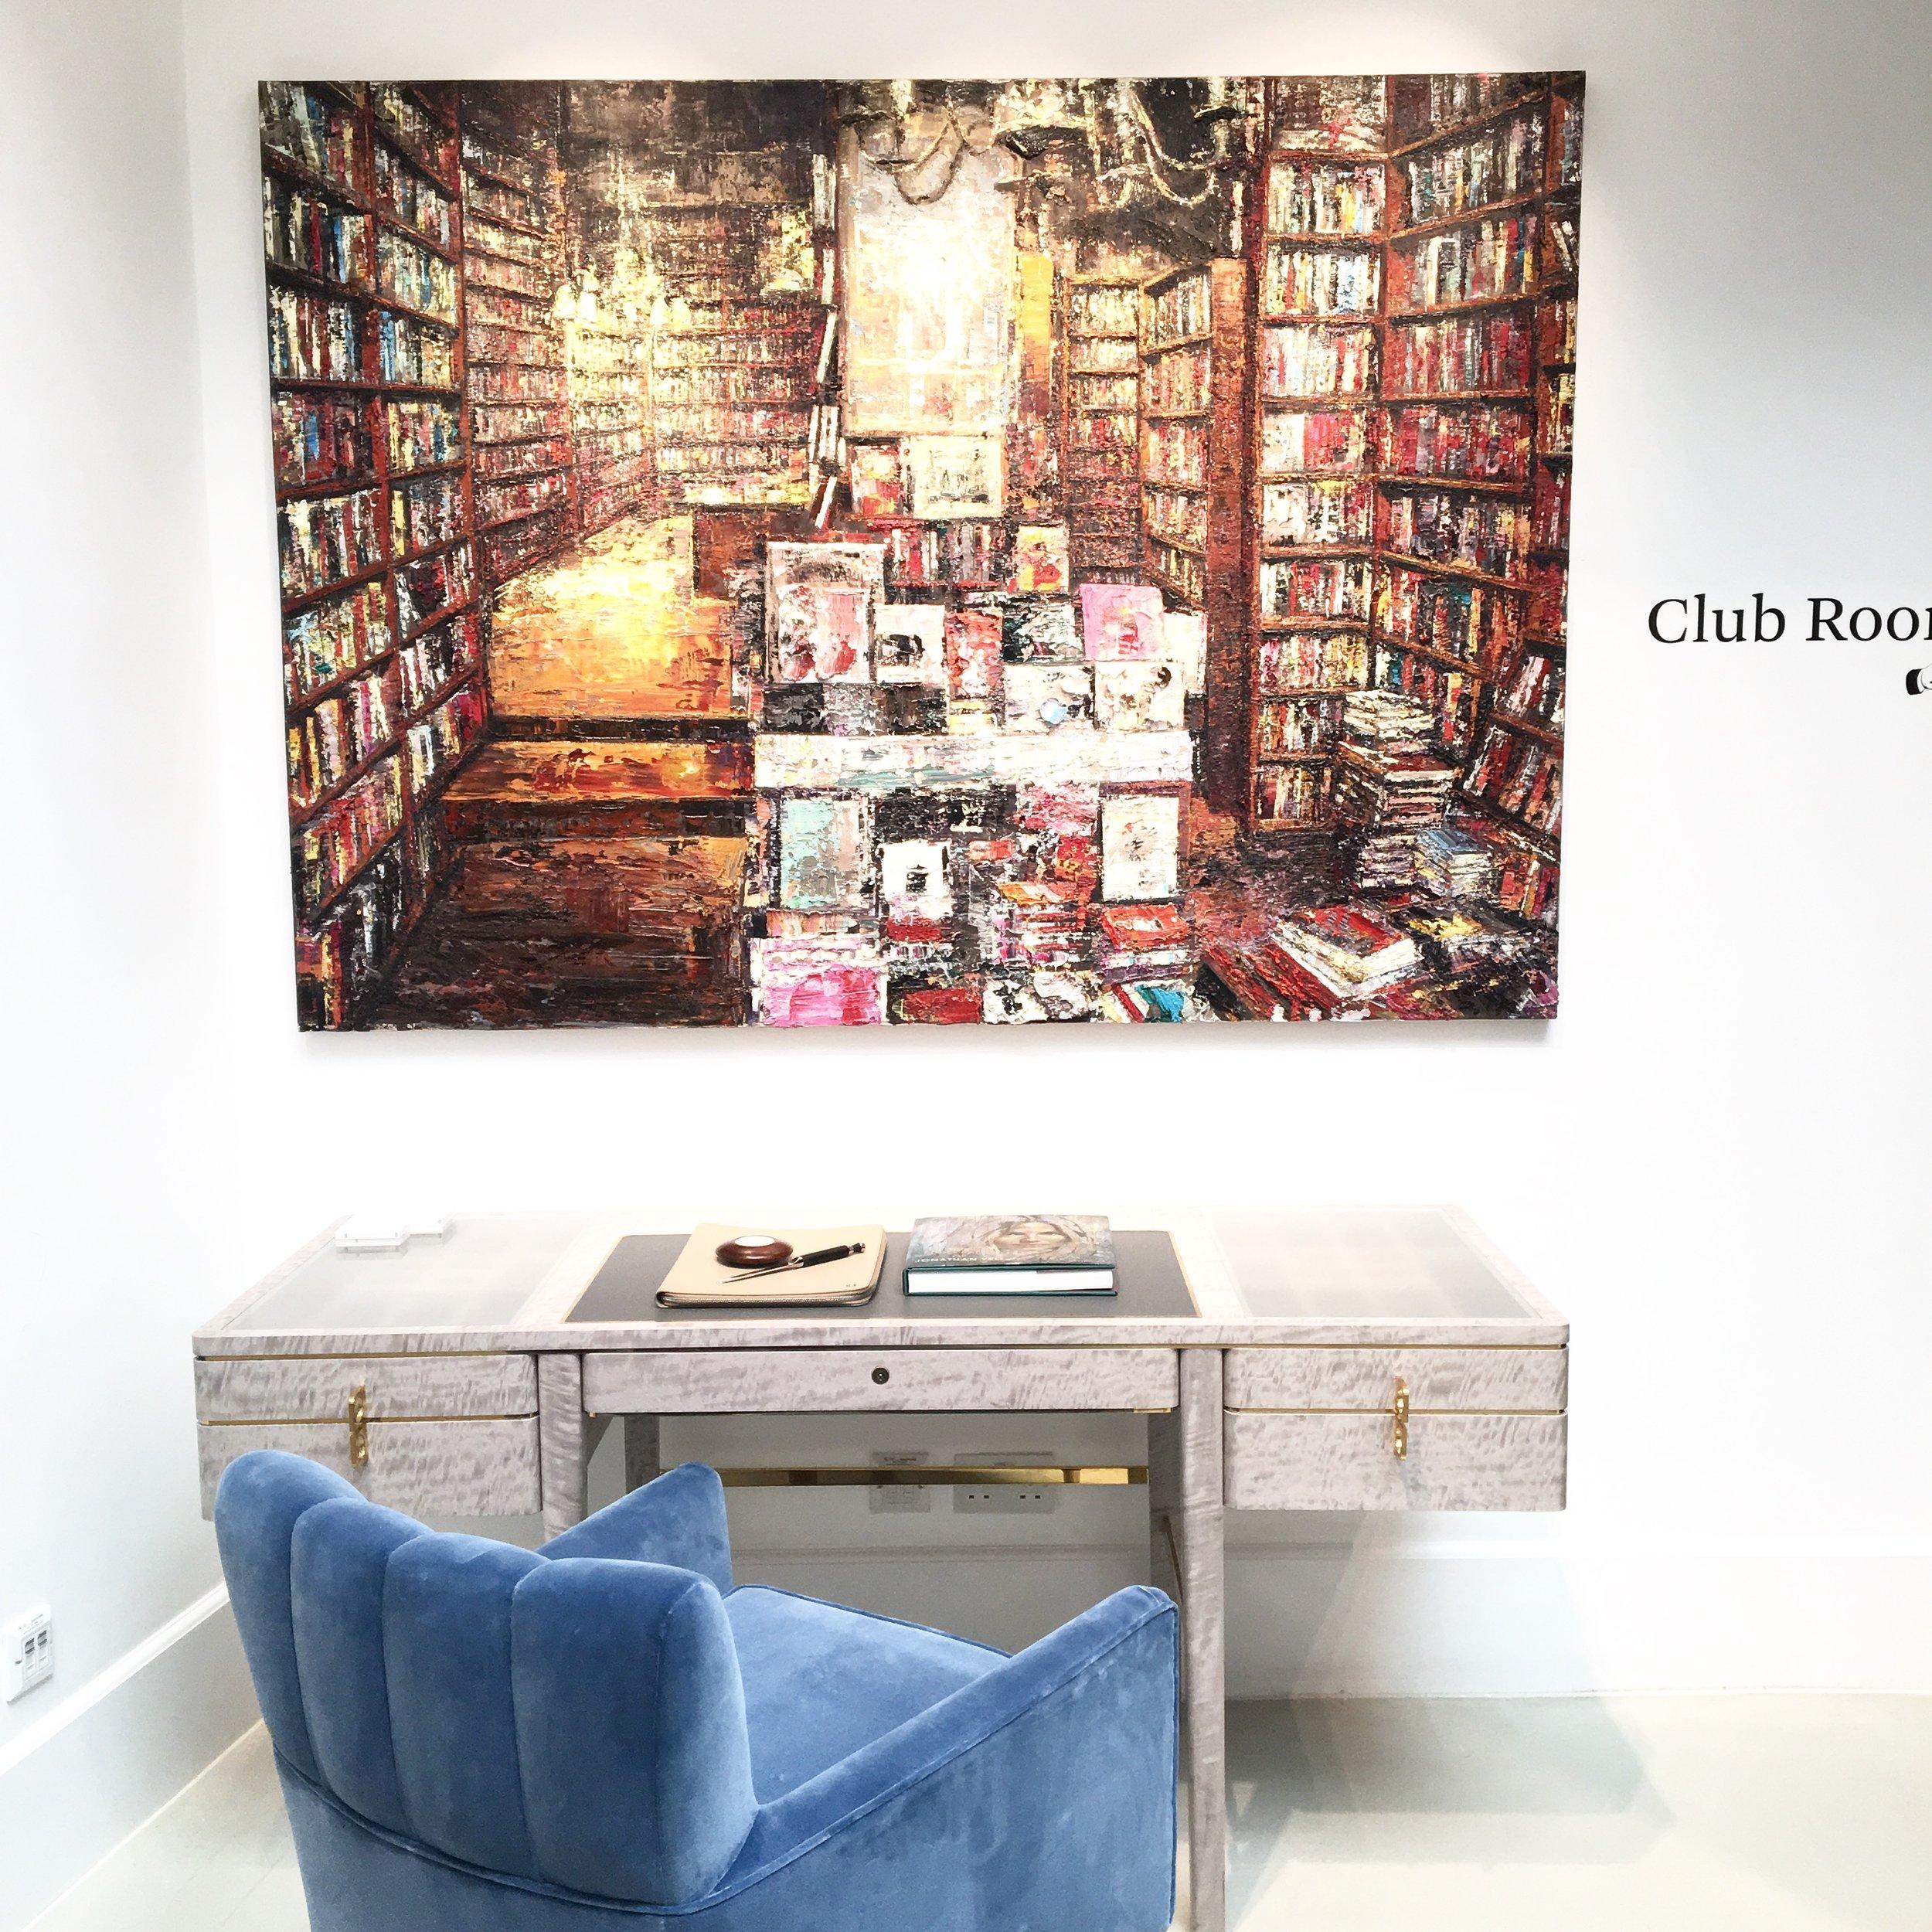 Massimo-Giannoni-Exhibition-Photo-2-Linley-London-Ransom-Art-Collaboration.jpg